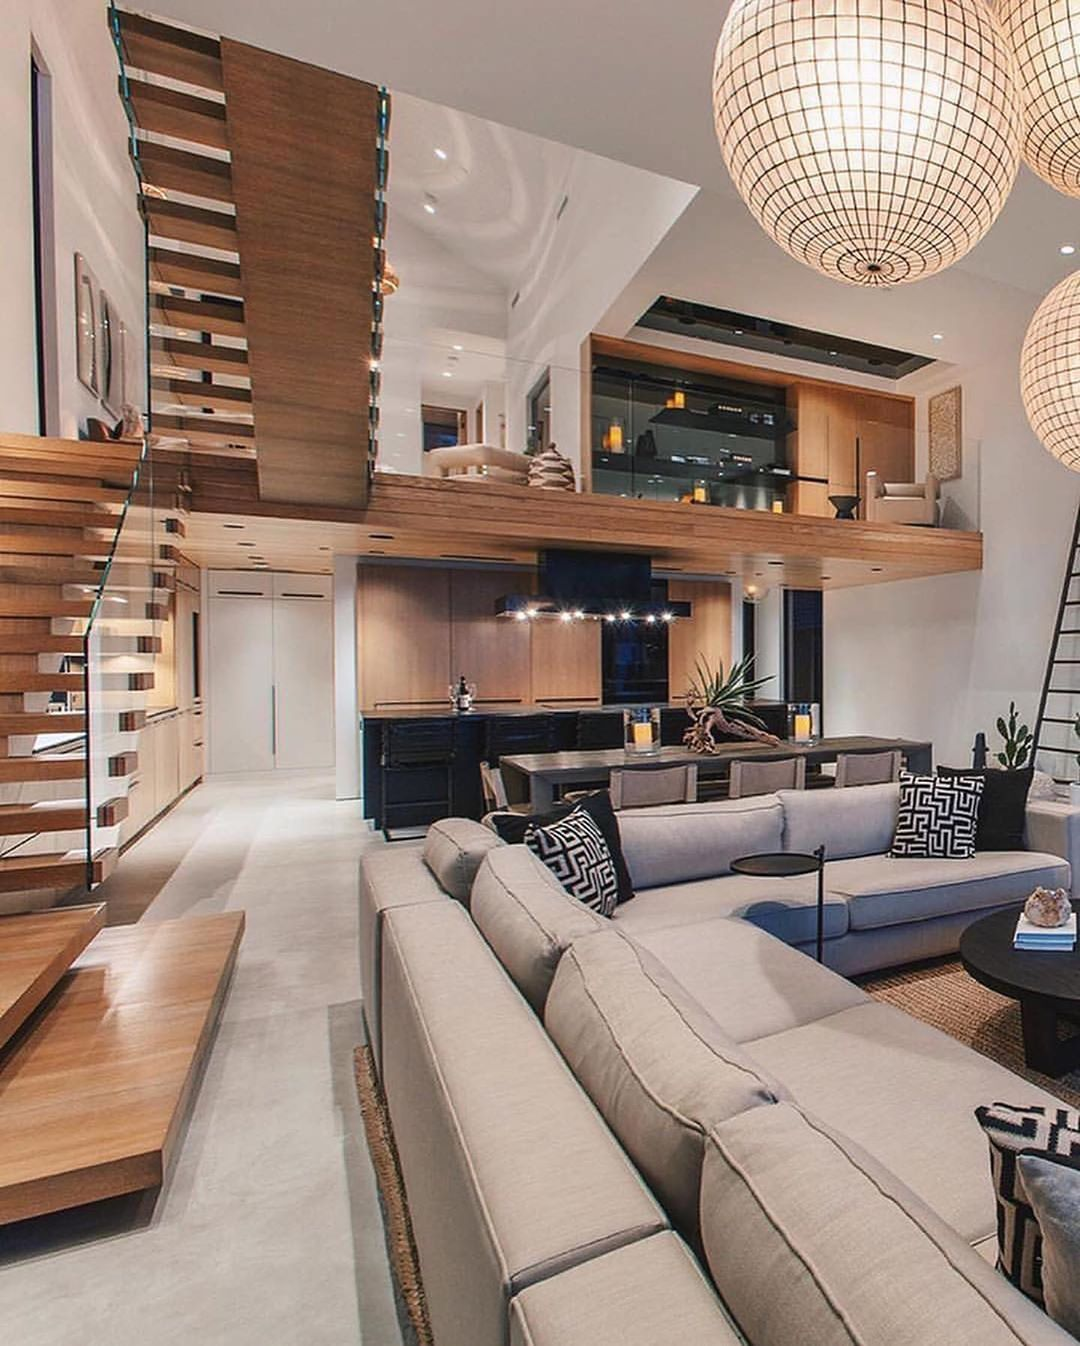 Best 23 Beegcom Best App For Creating Interior Design Boards In 2020 Loft Design Luxury House Designs Luxury Interior